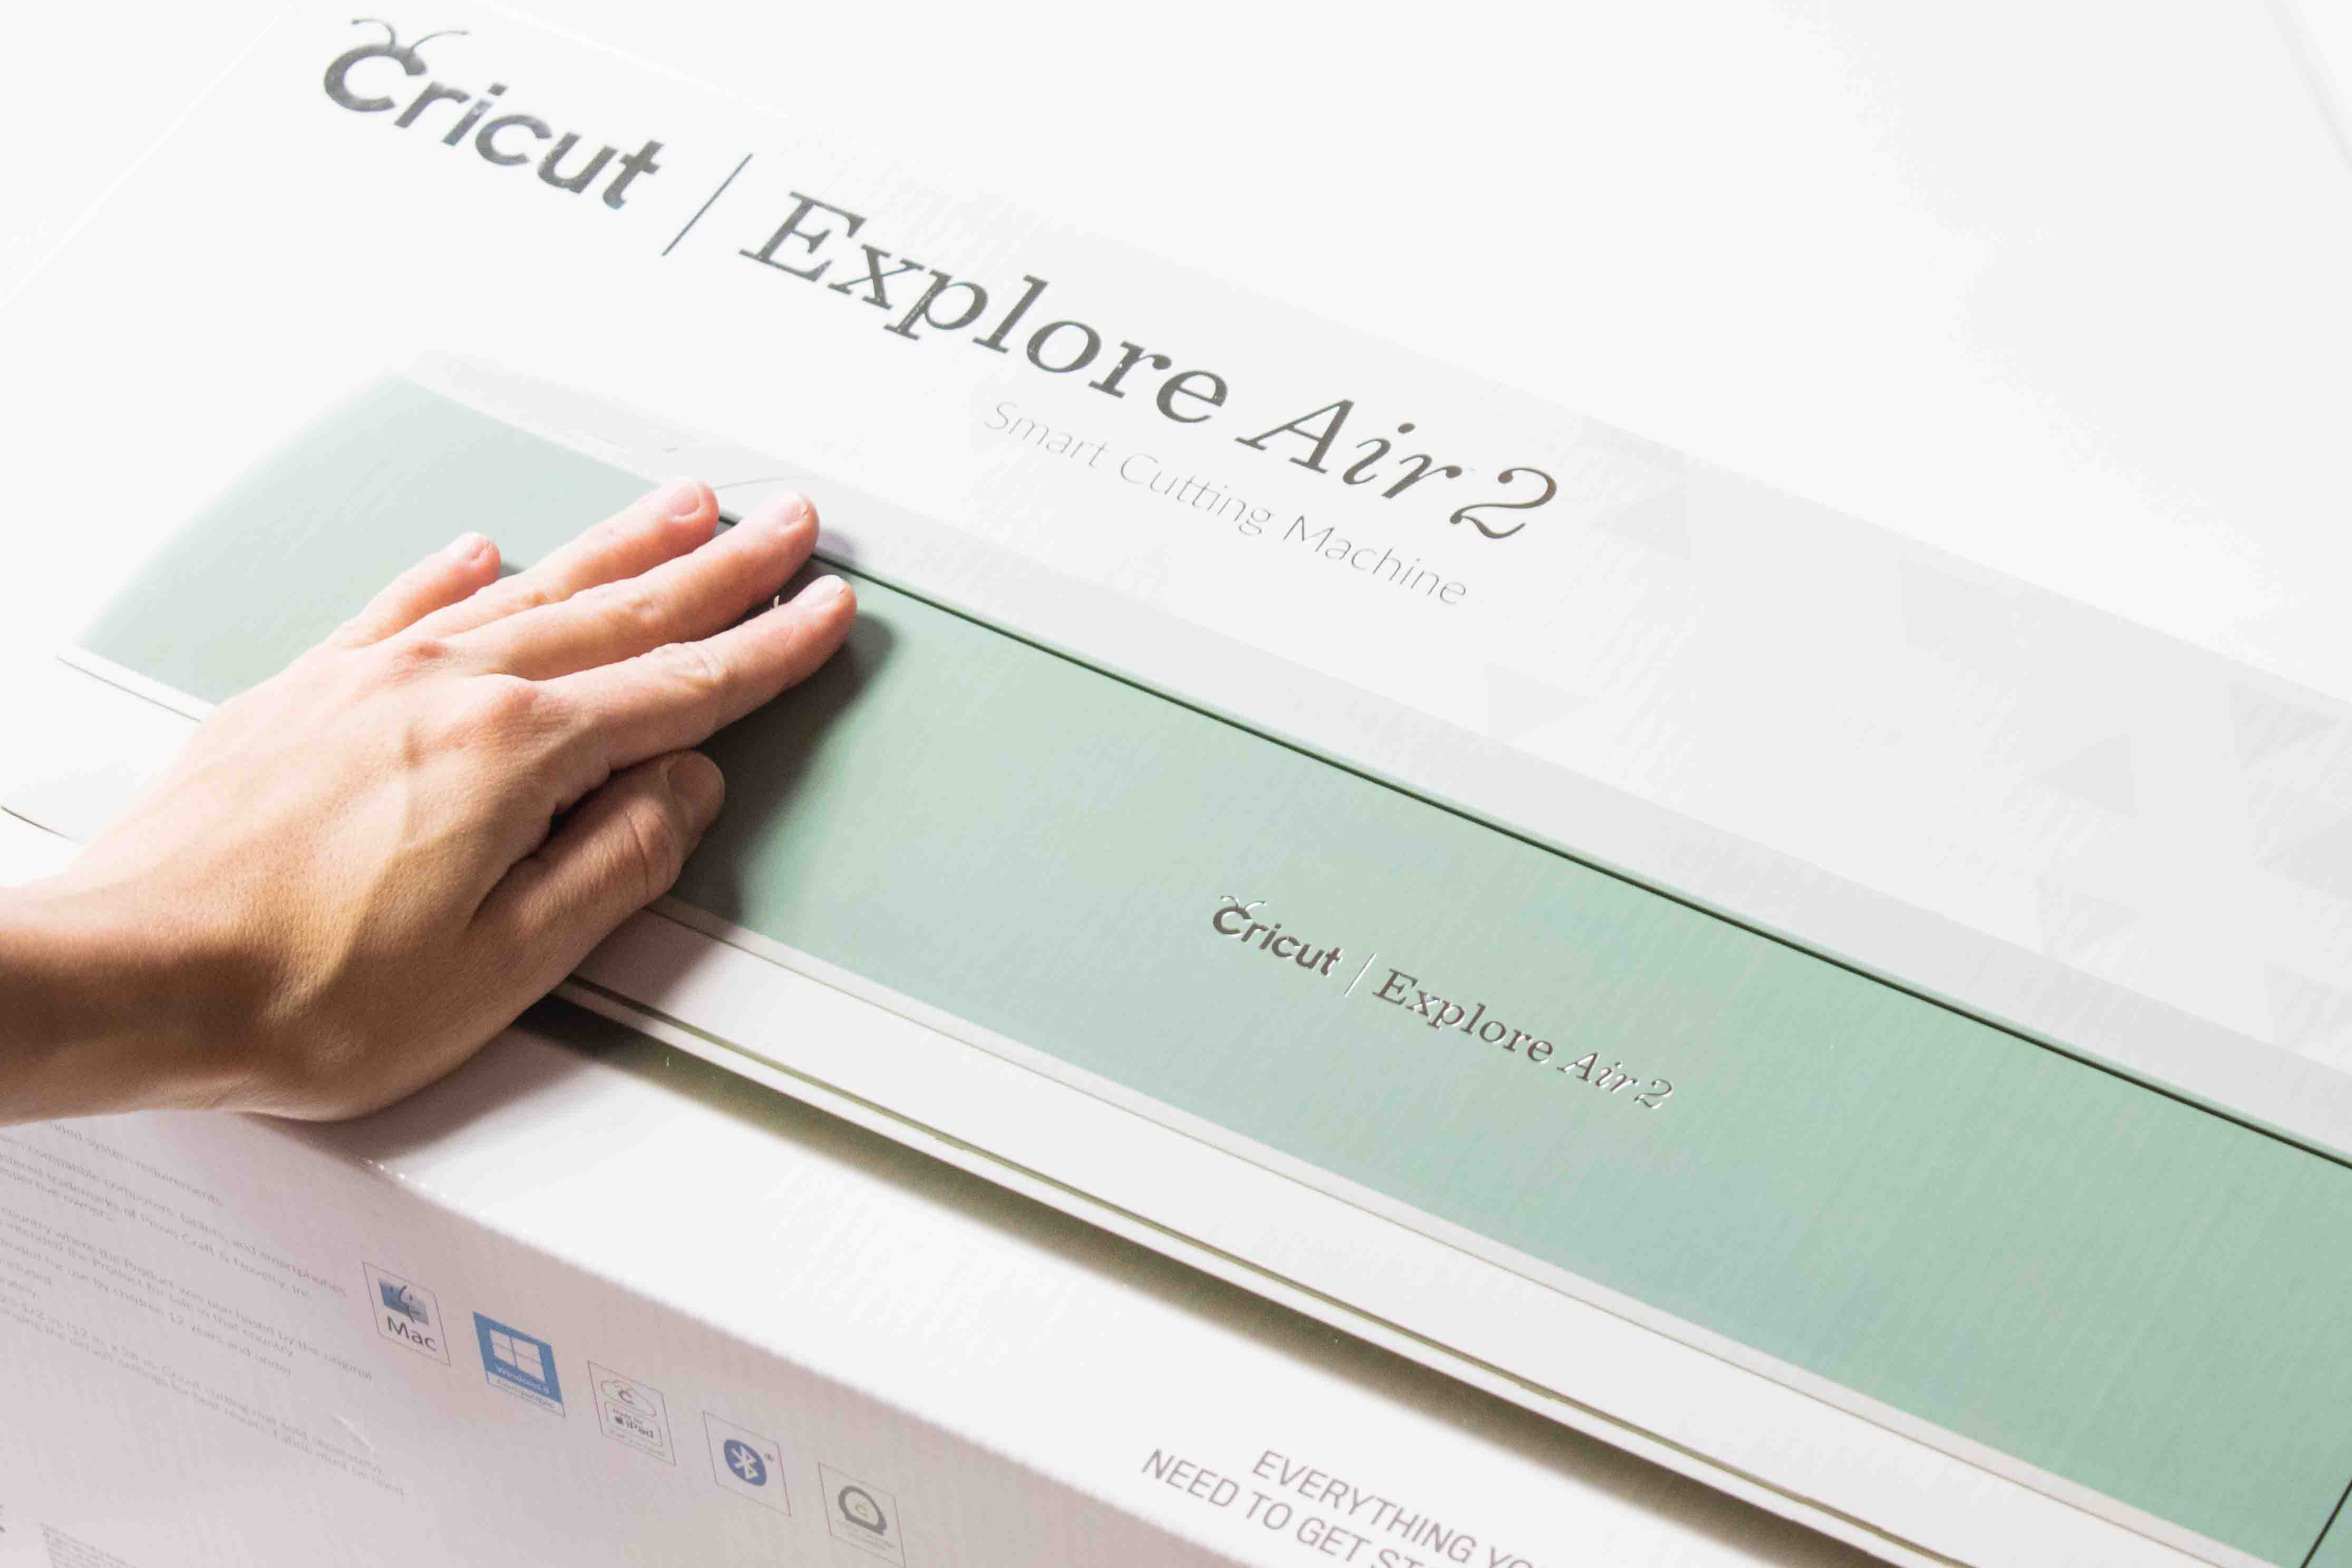 Cricut Explore Air 2 inside the box